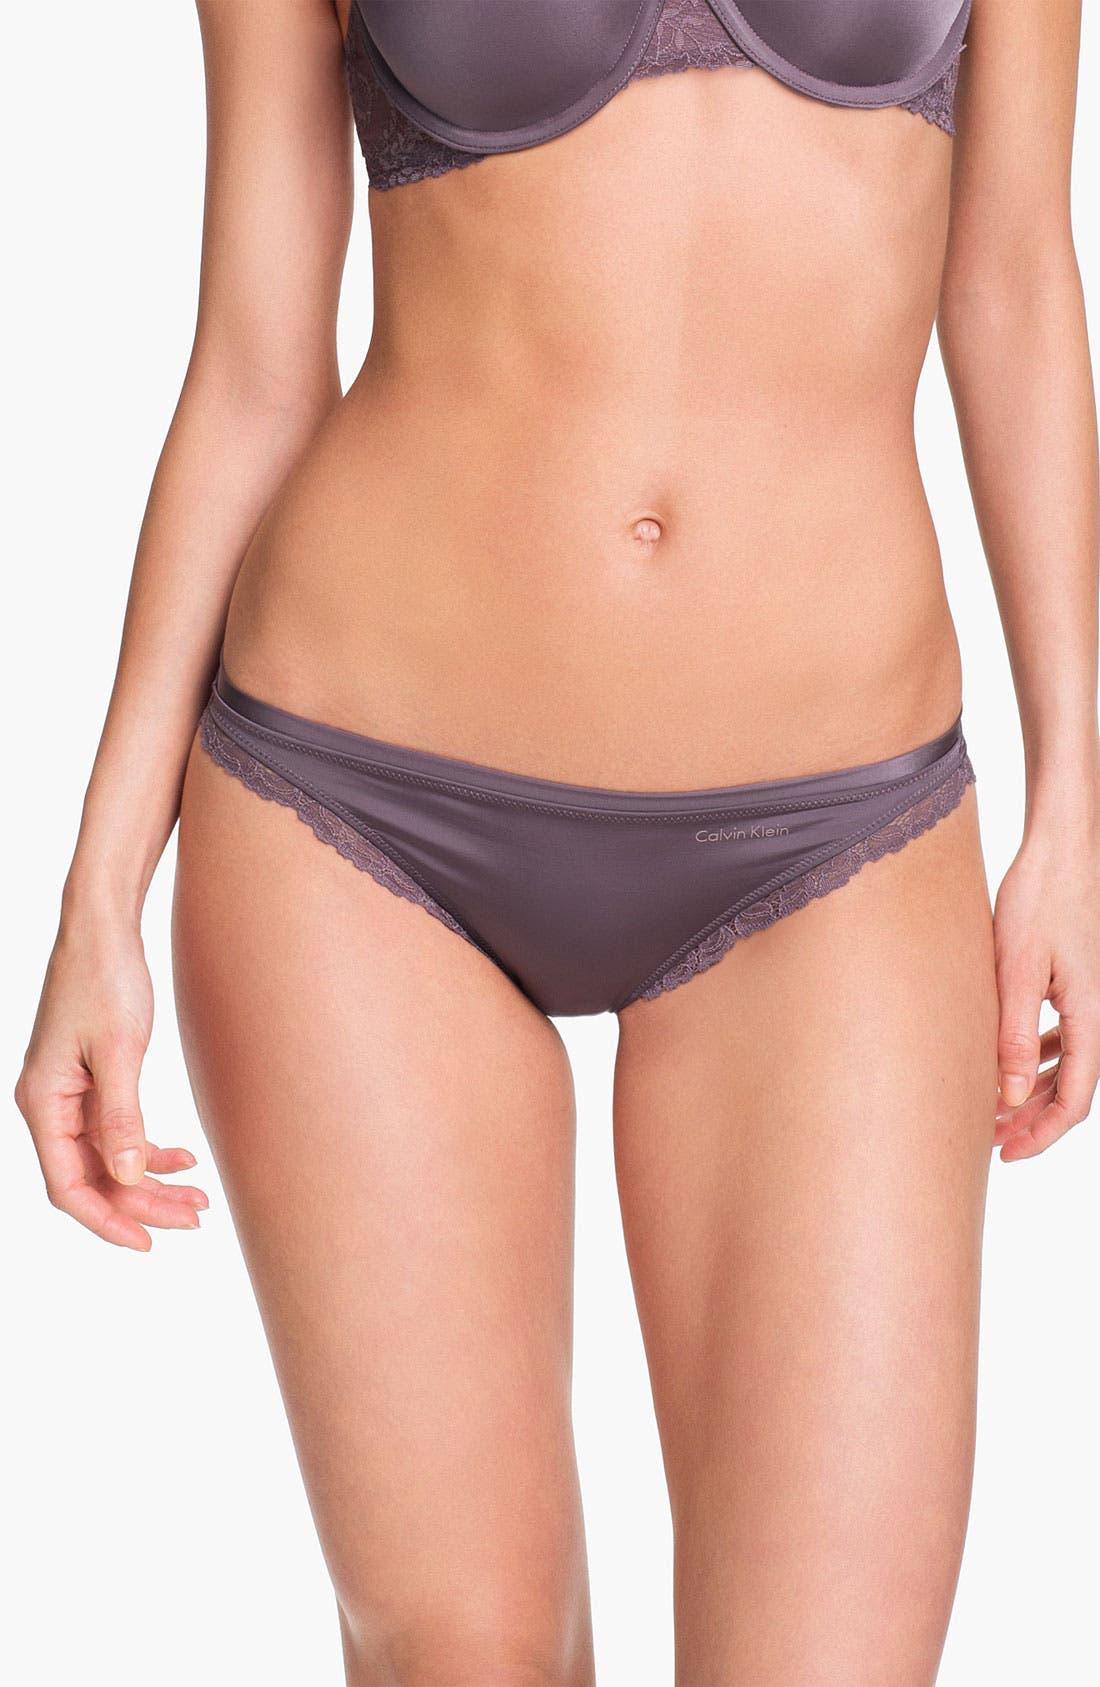 Alternate Image 1 Selected - Calvin Klein 'Seductive Comfort' Lace Trim Bikini